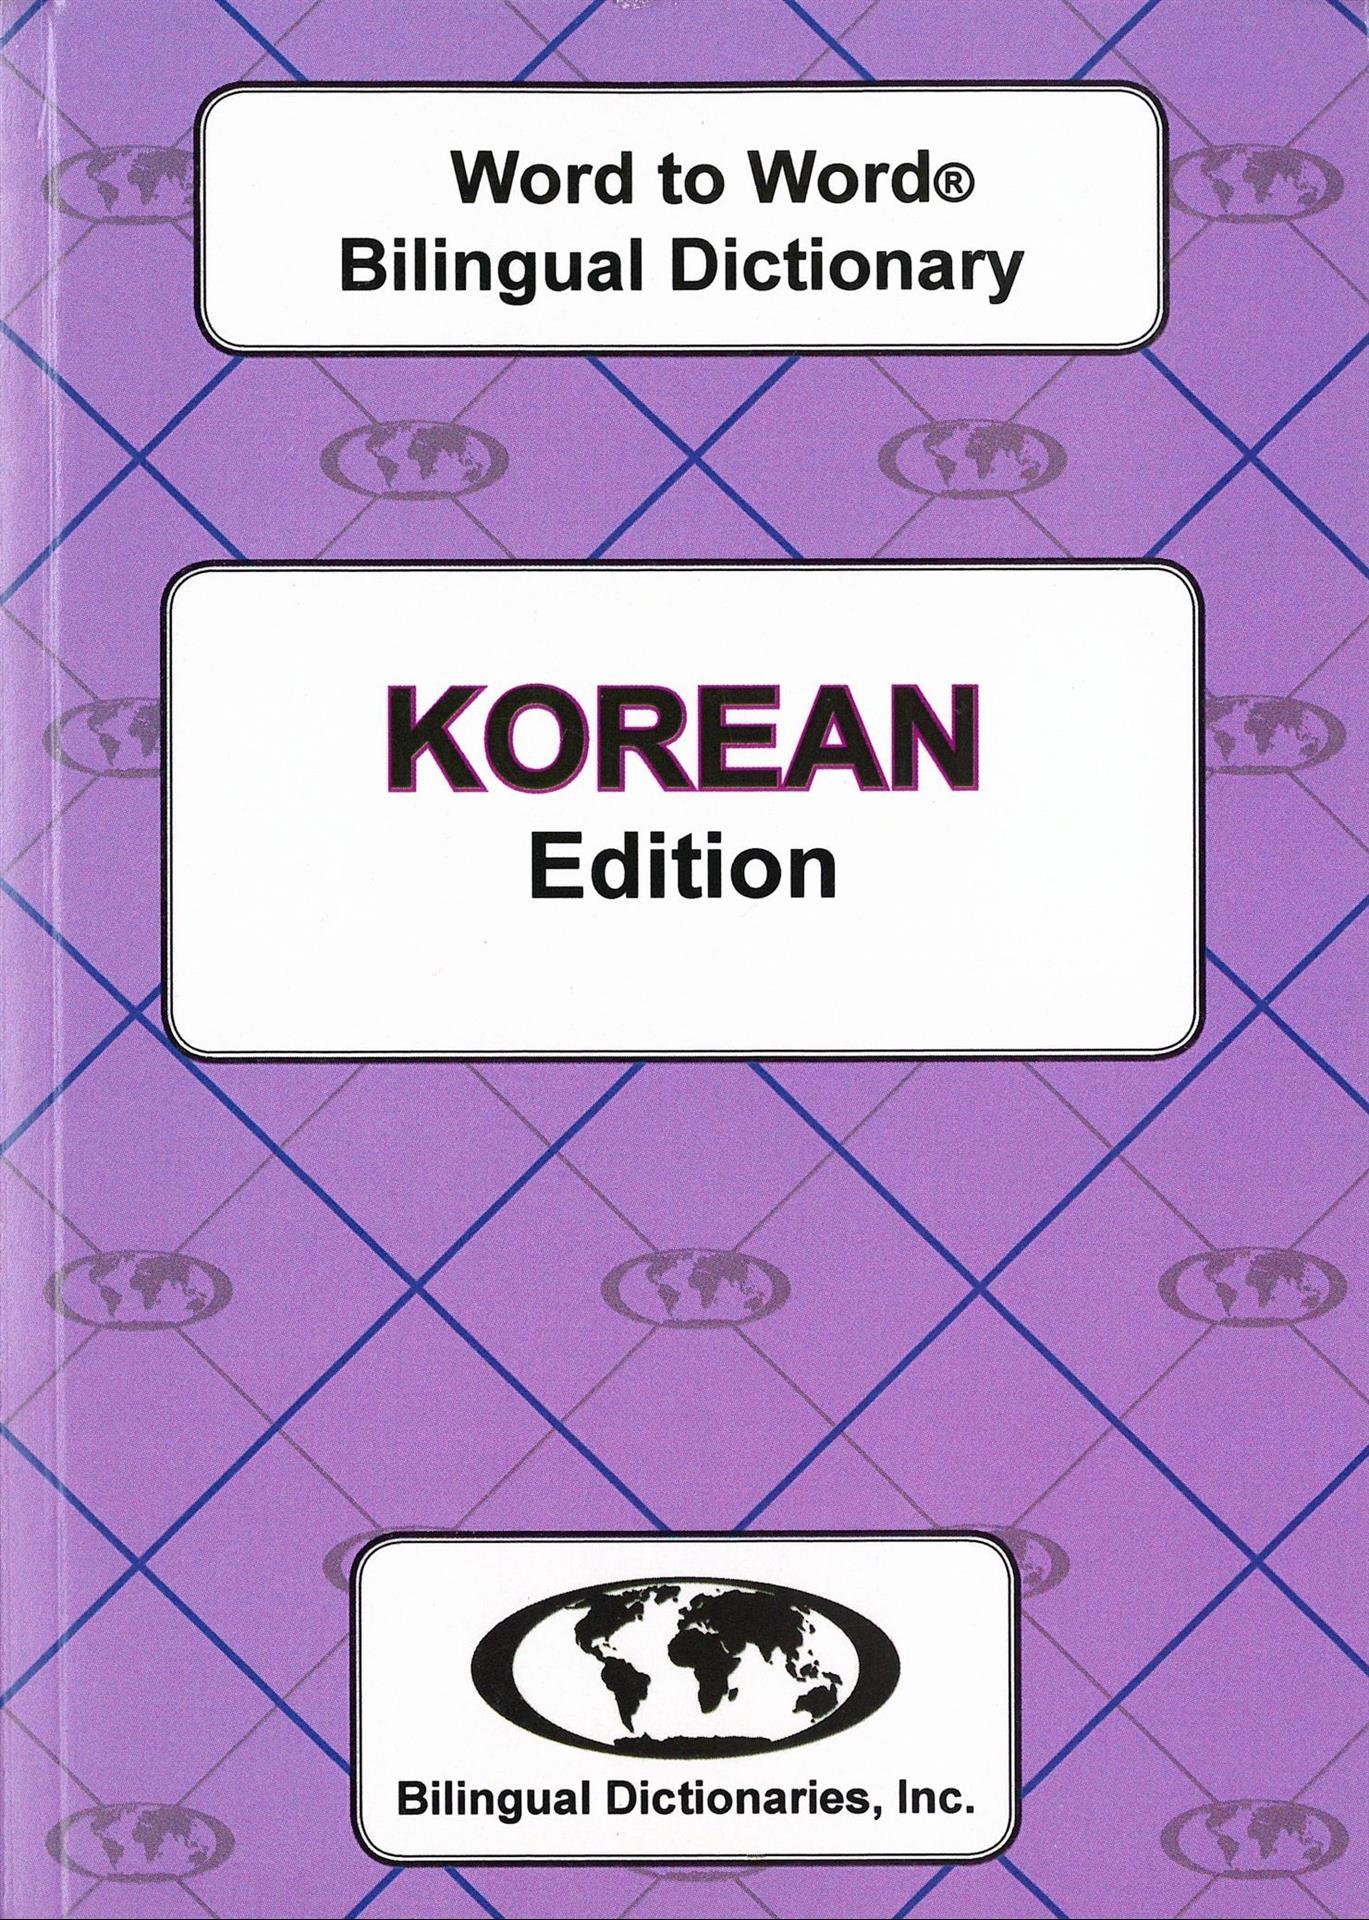 KOREAN Word to Word Bilingual Dictionary